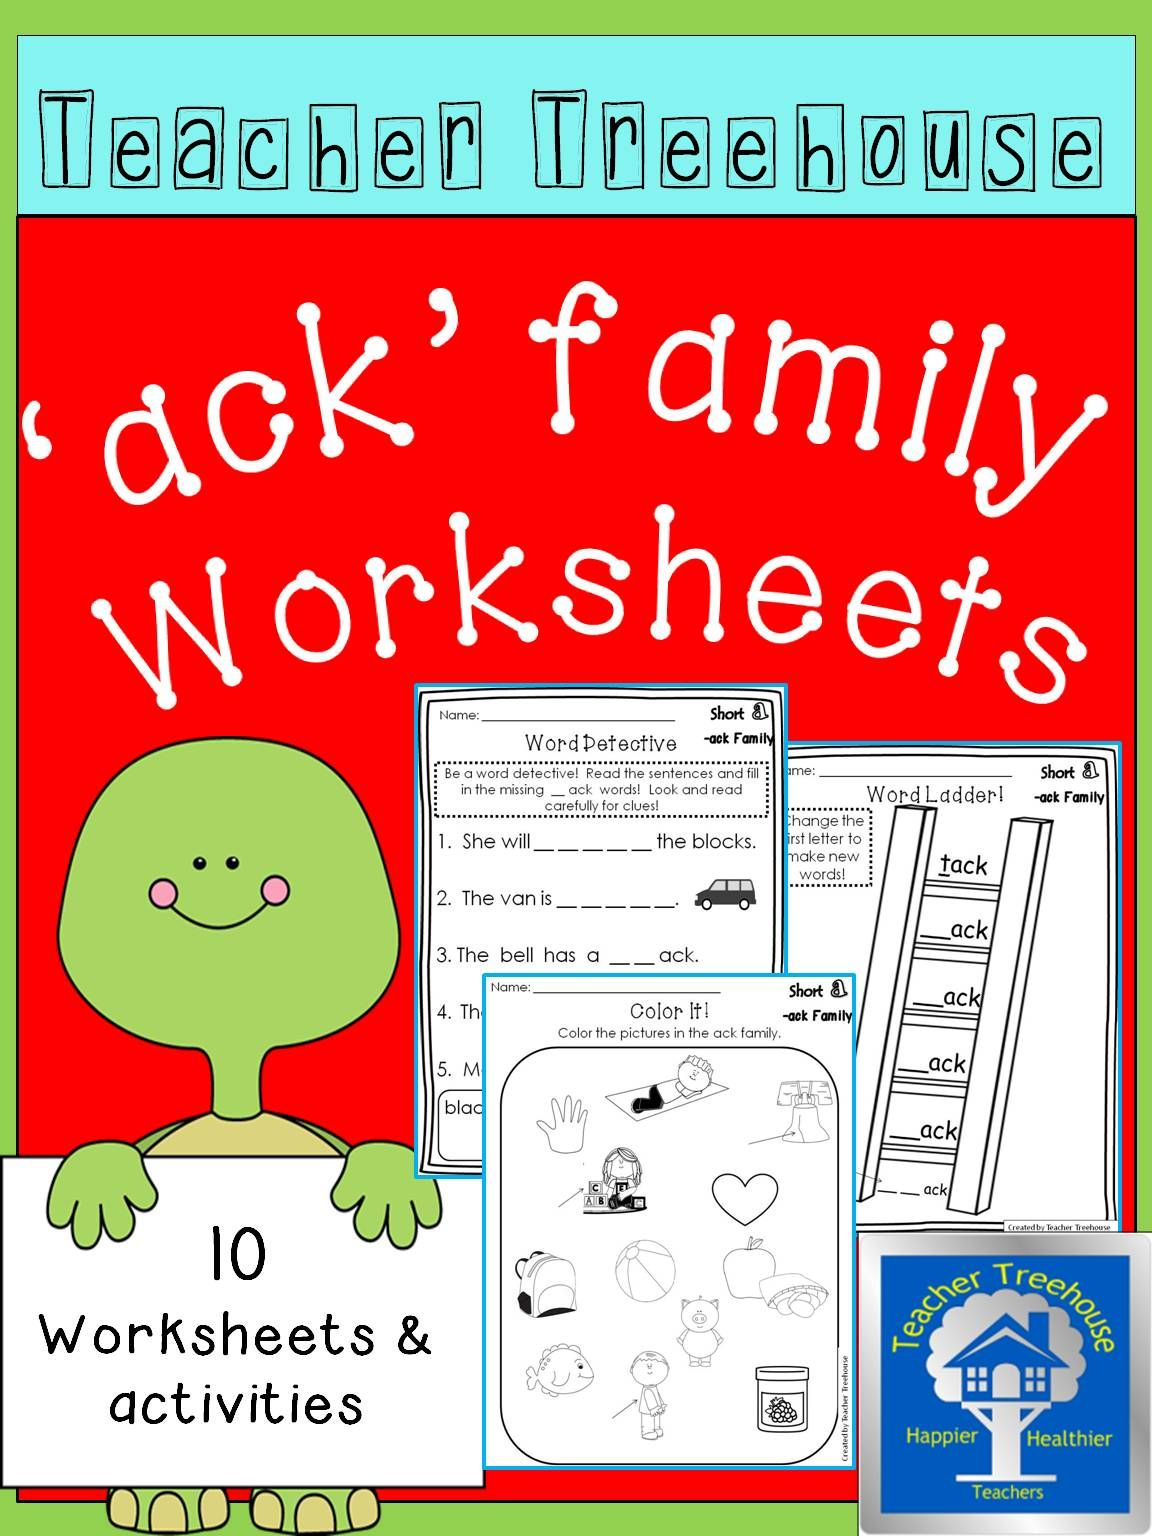 ACK Word Family Worksheets - ACK Family Worksheets - ACK Worksheets   Word  families [ 1536 x 1152 Pixel ]